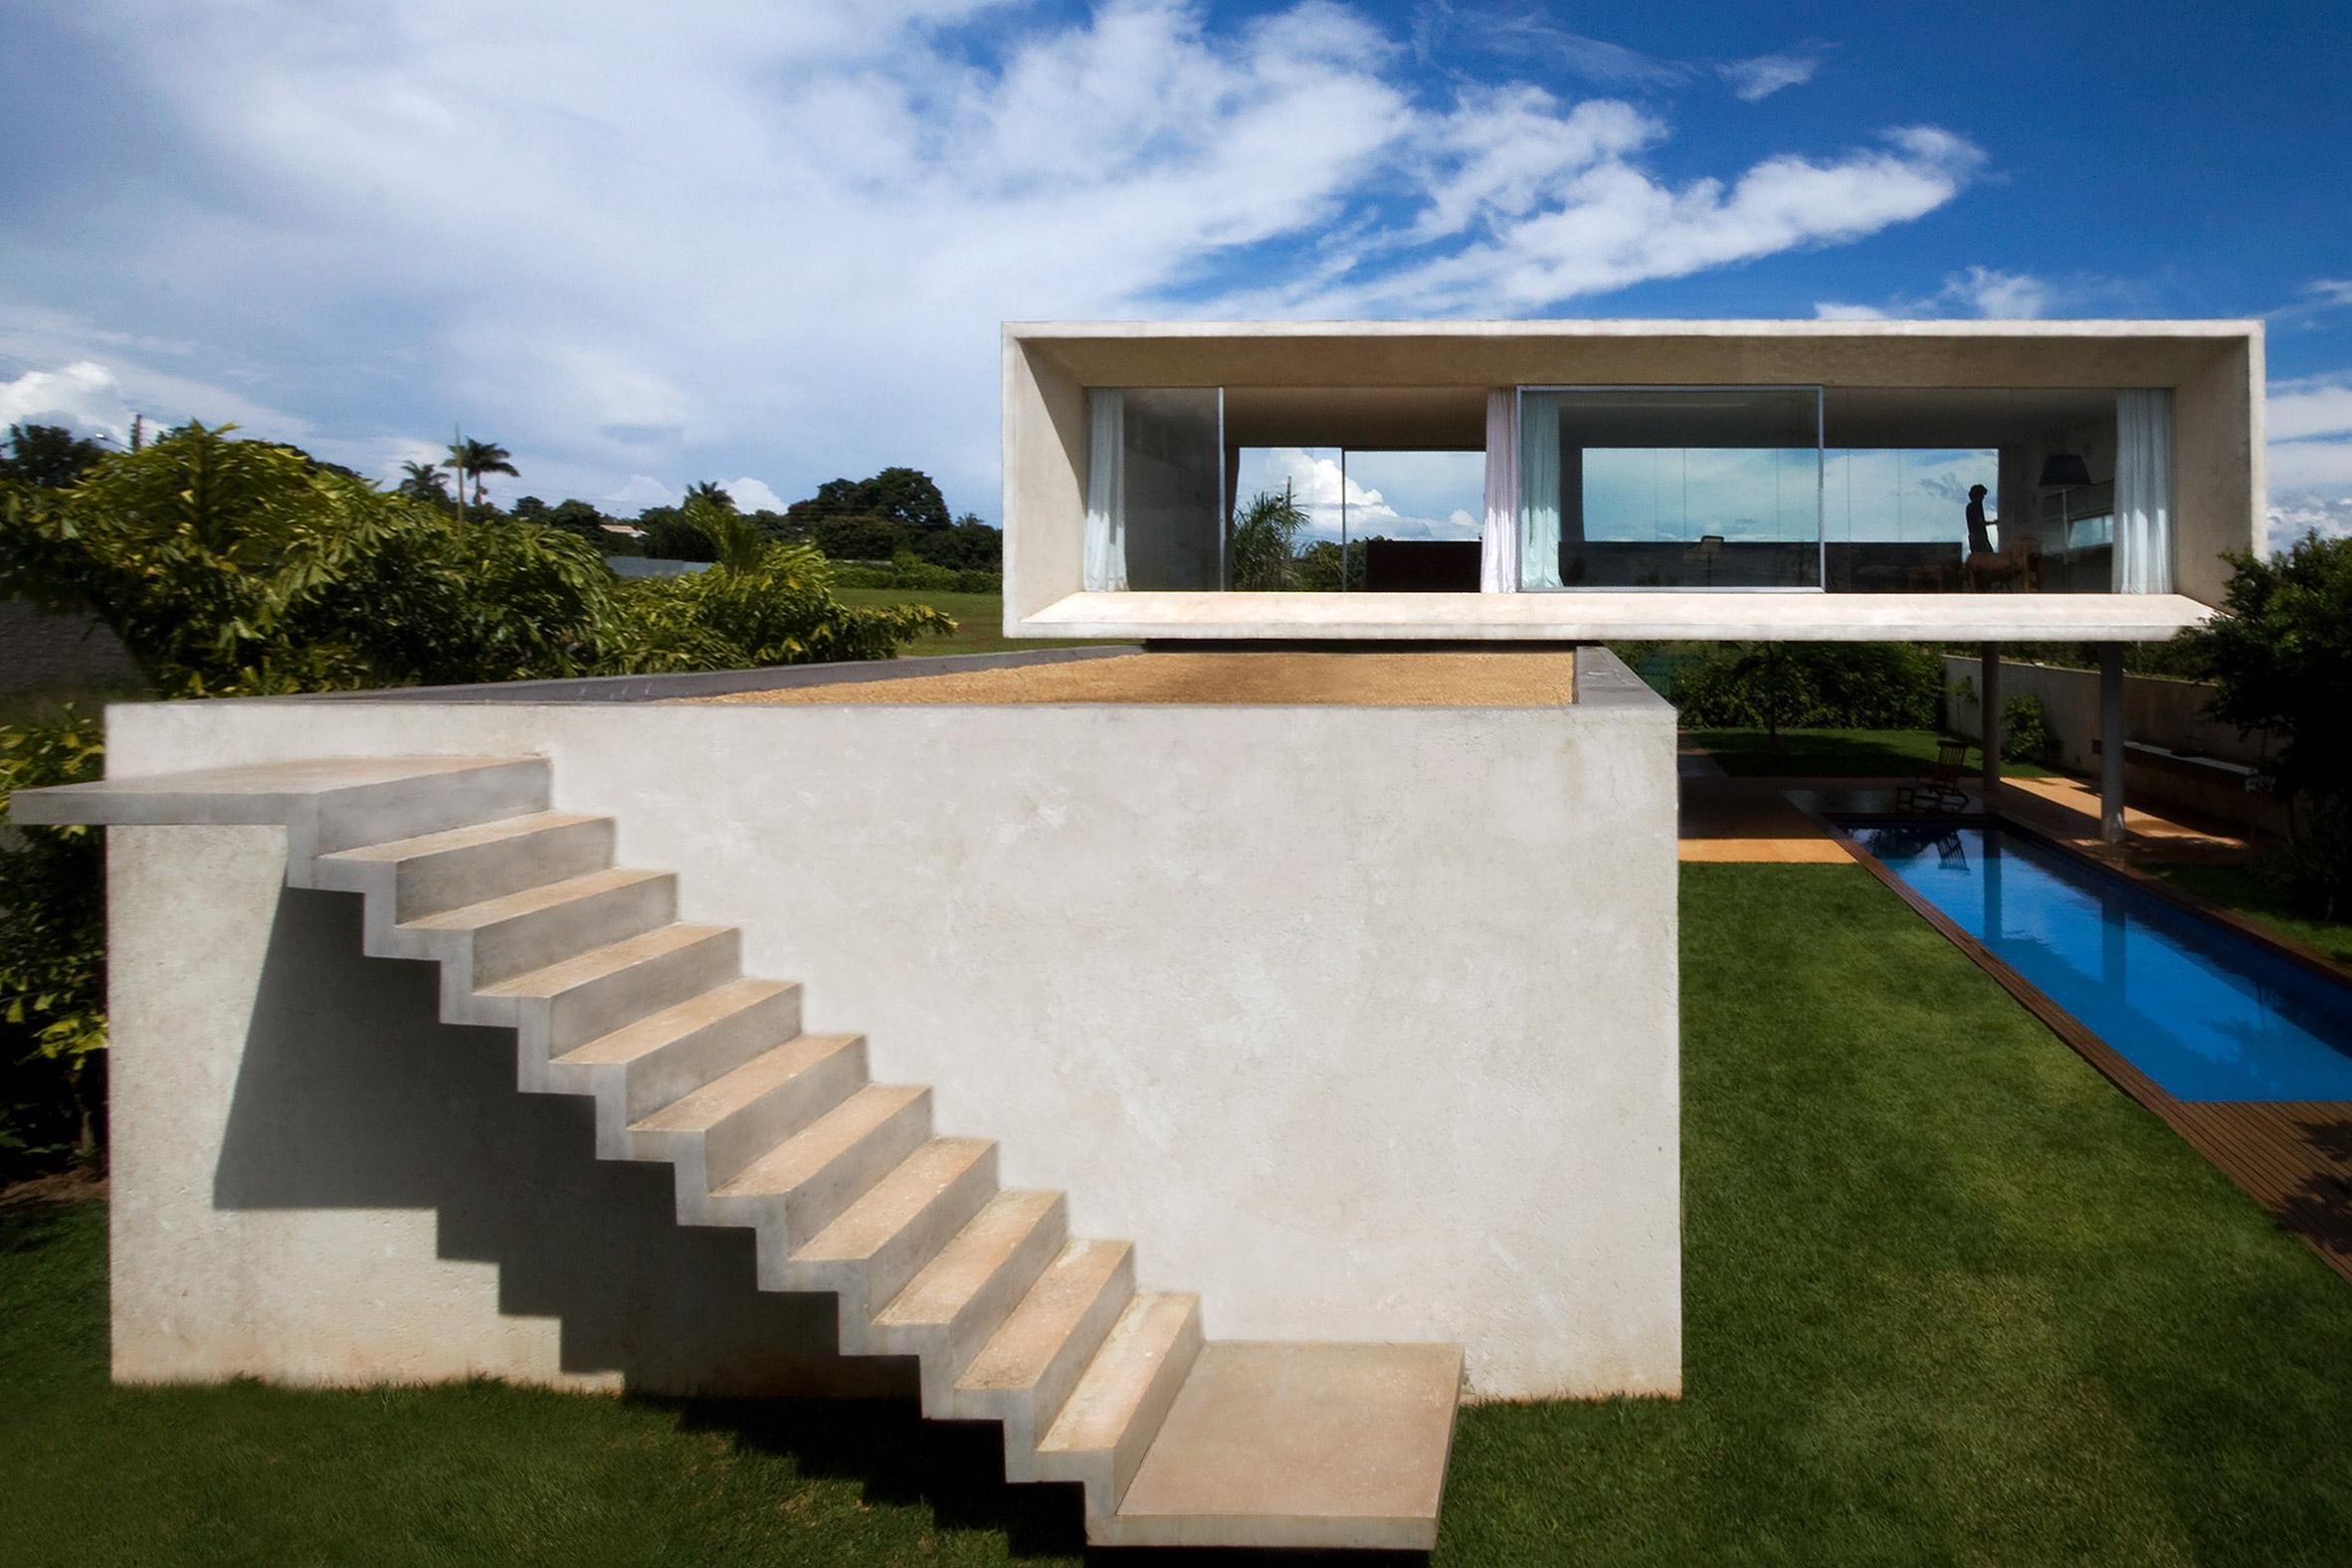 Studio MK27 takes cues from Brazilian modernism for Osler House in Brasília